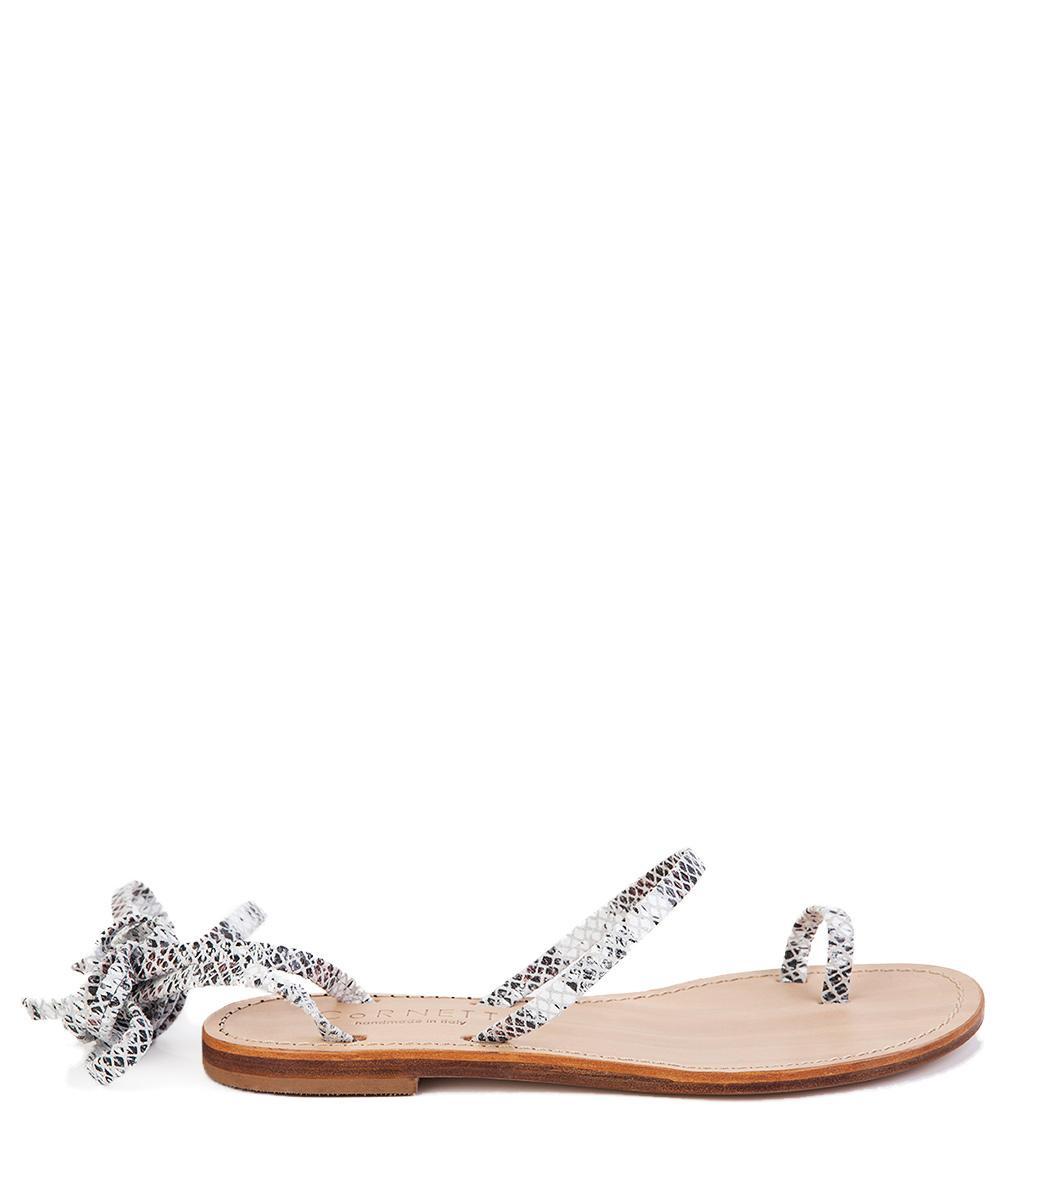 6bb936529537 Cornetti Alicudi Sandal In White Python Embosed Leather